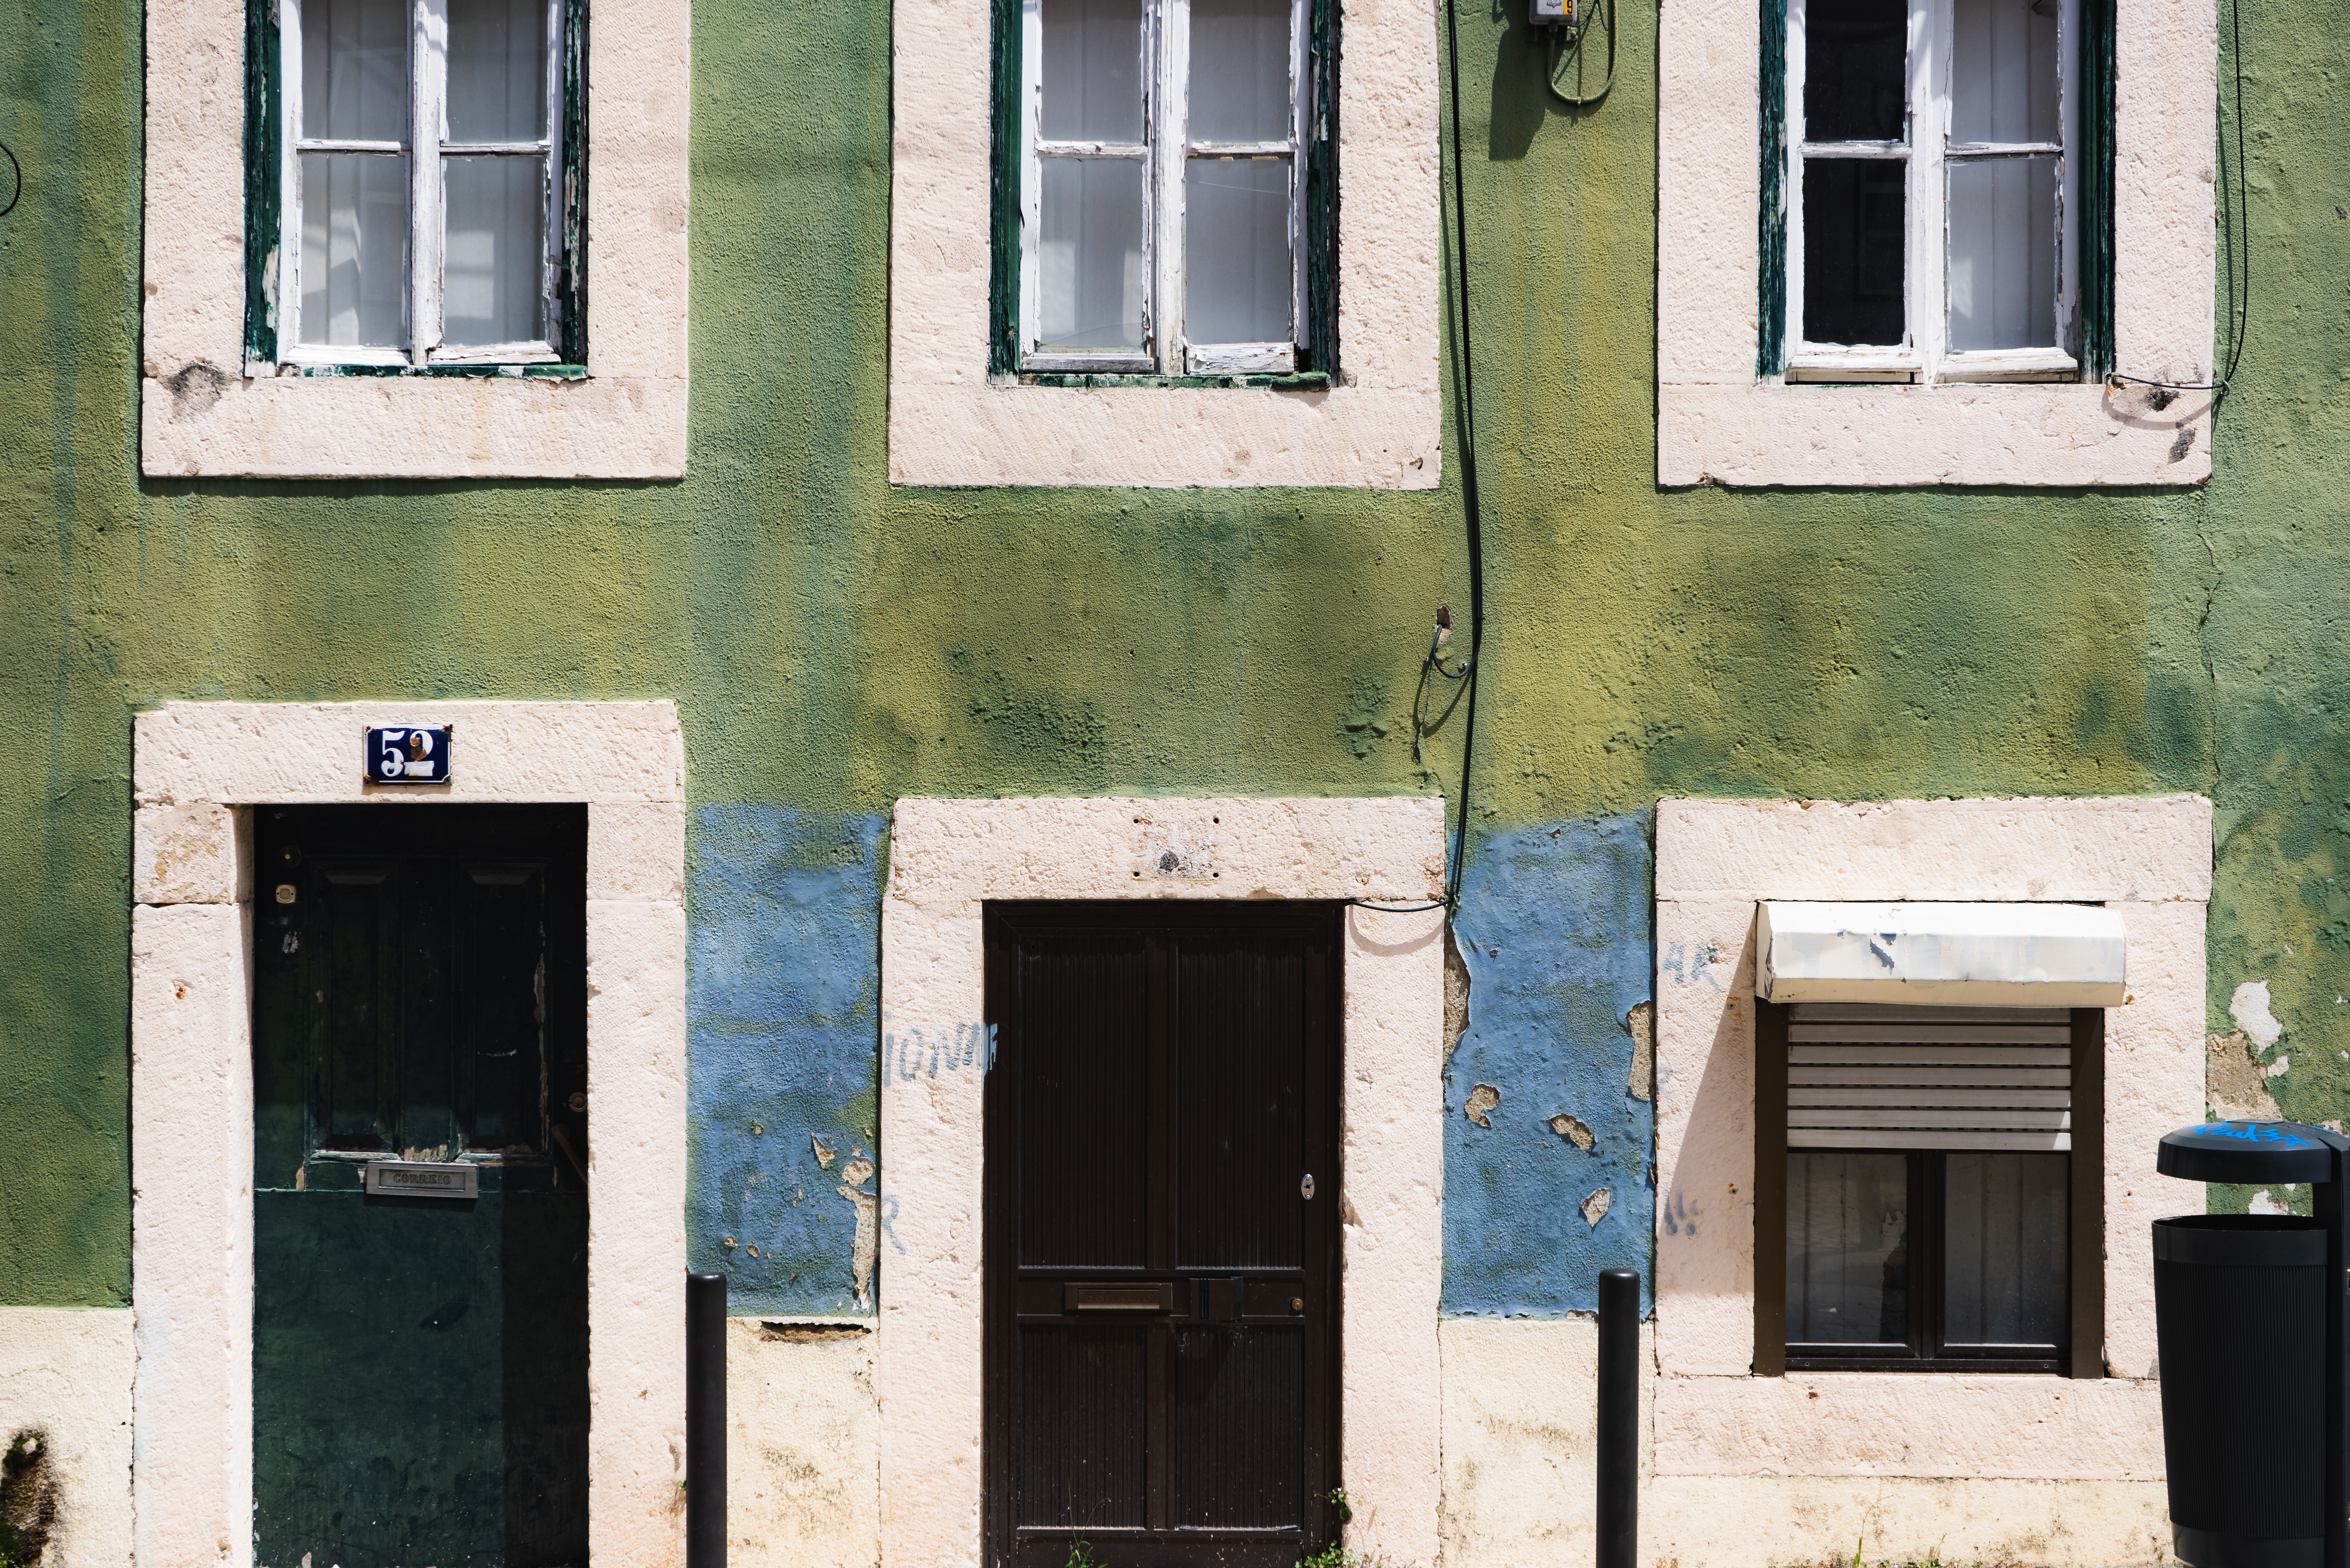 Ehud Neuhaus/Unsplash